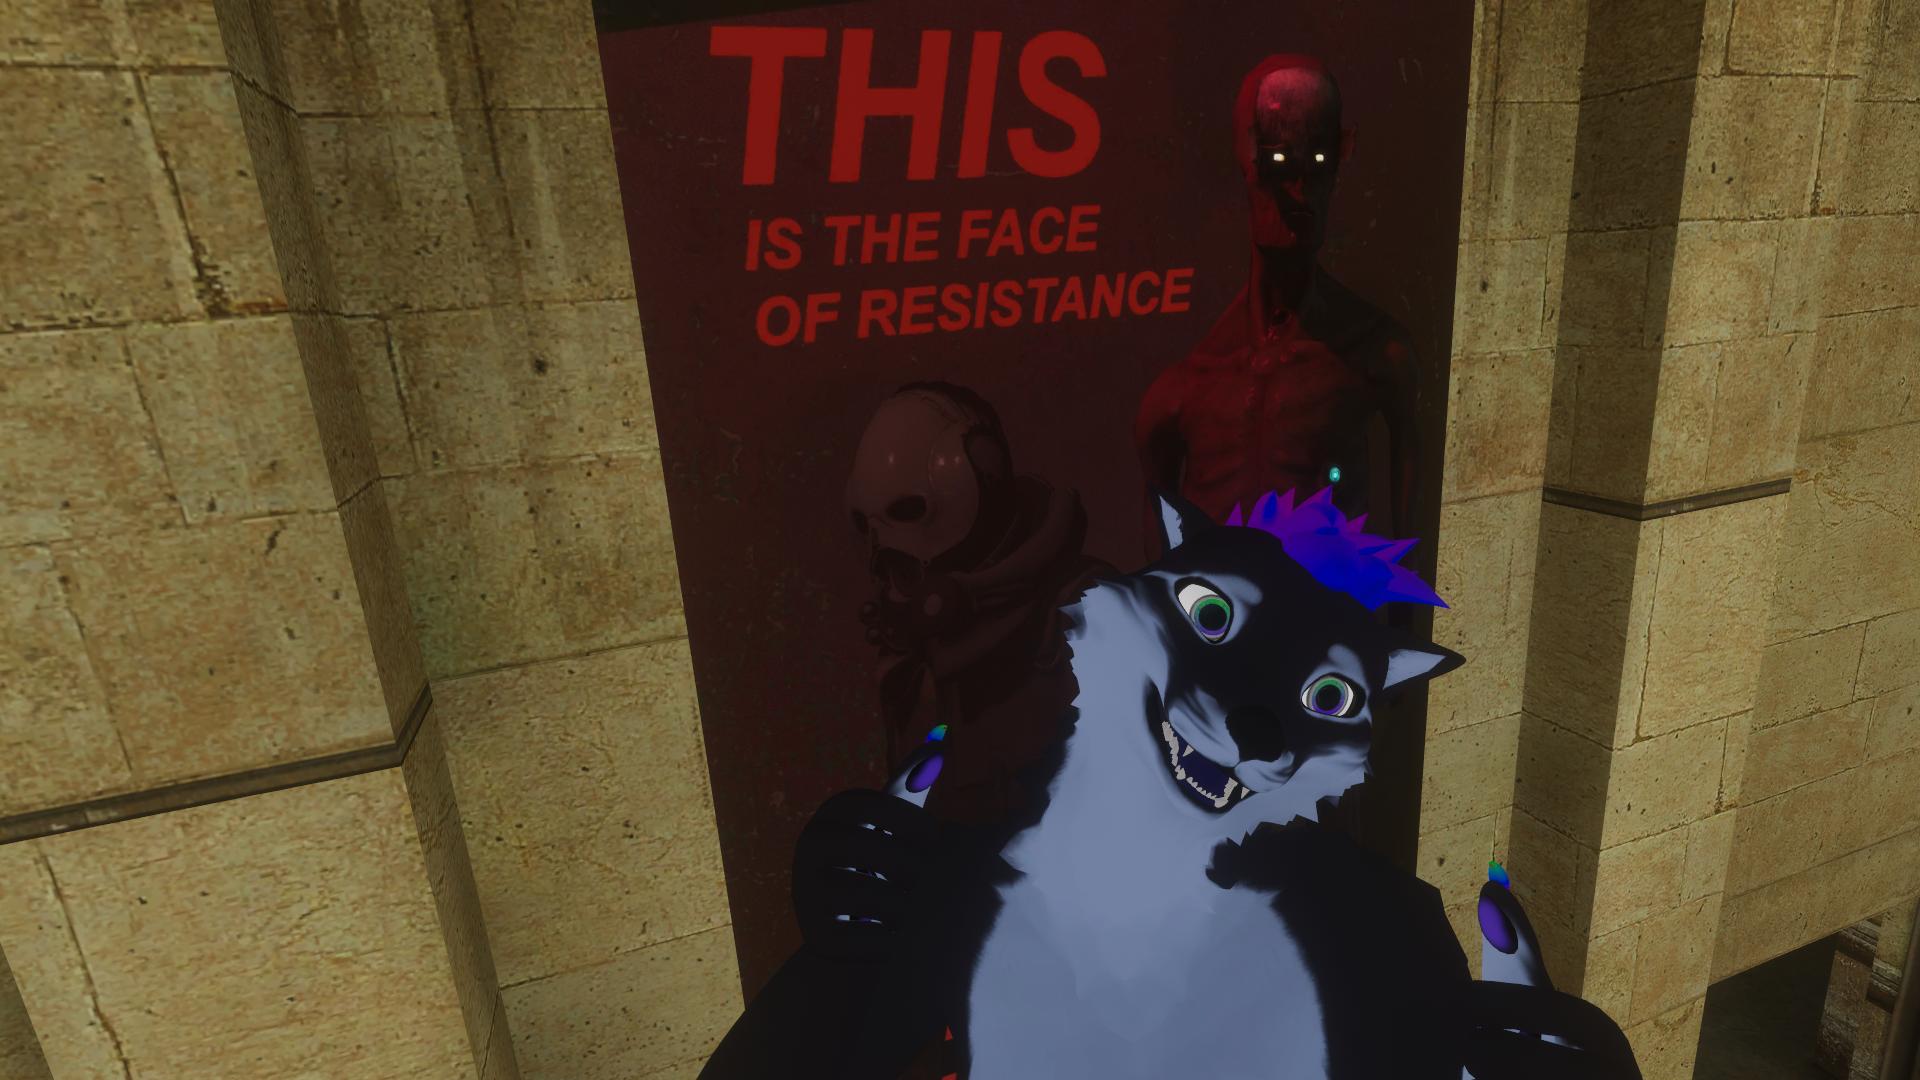 Rated Arrrgh: A VR Postscript